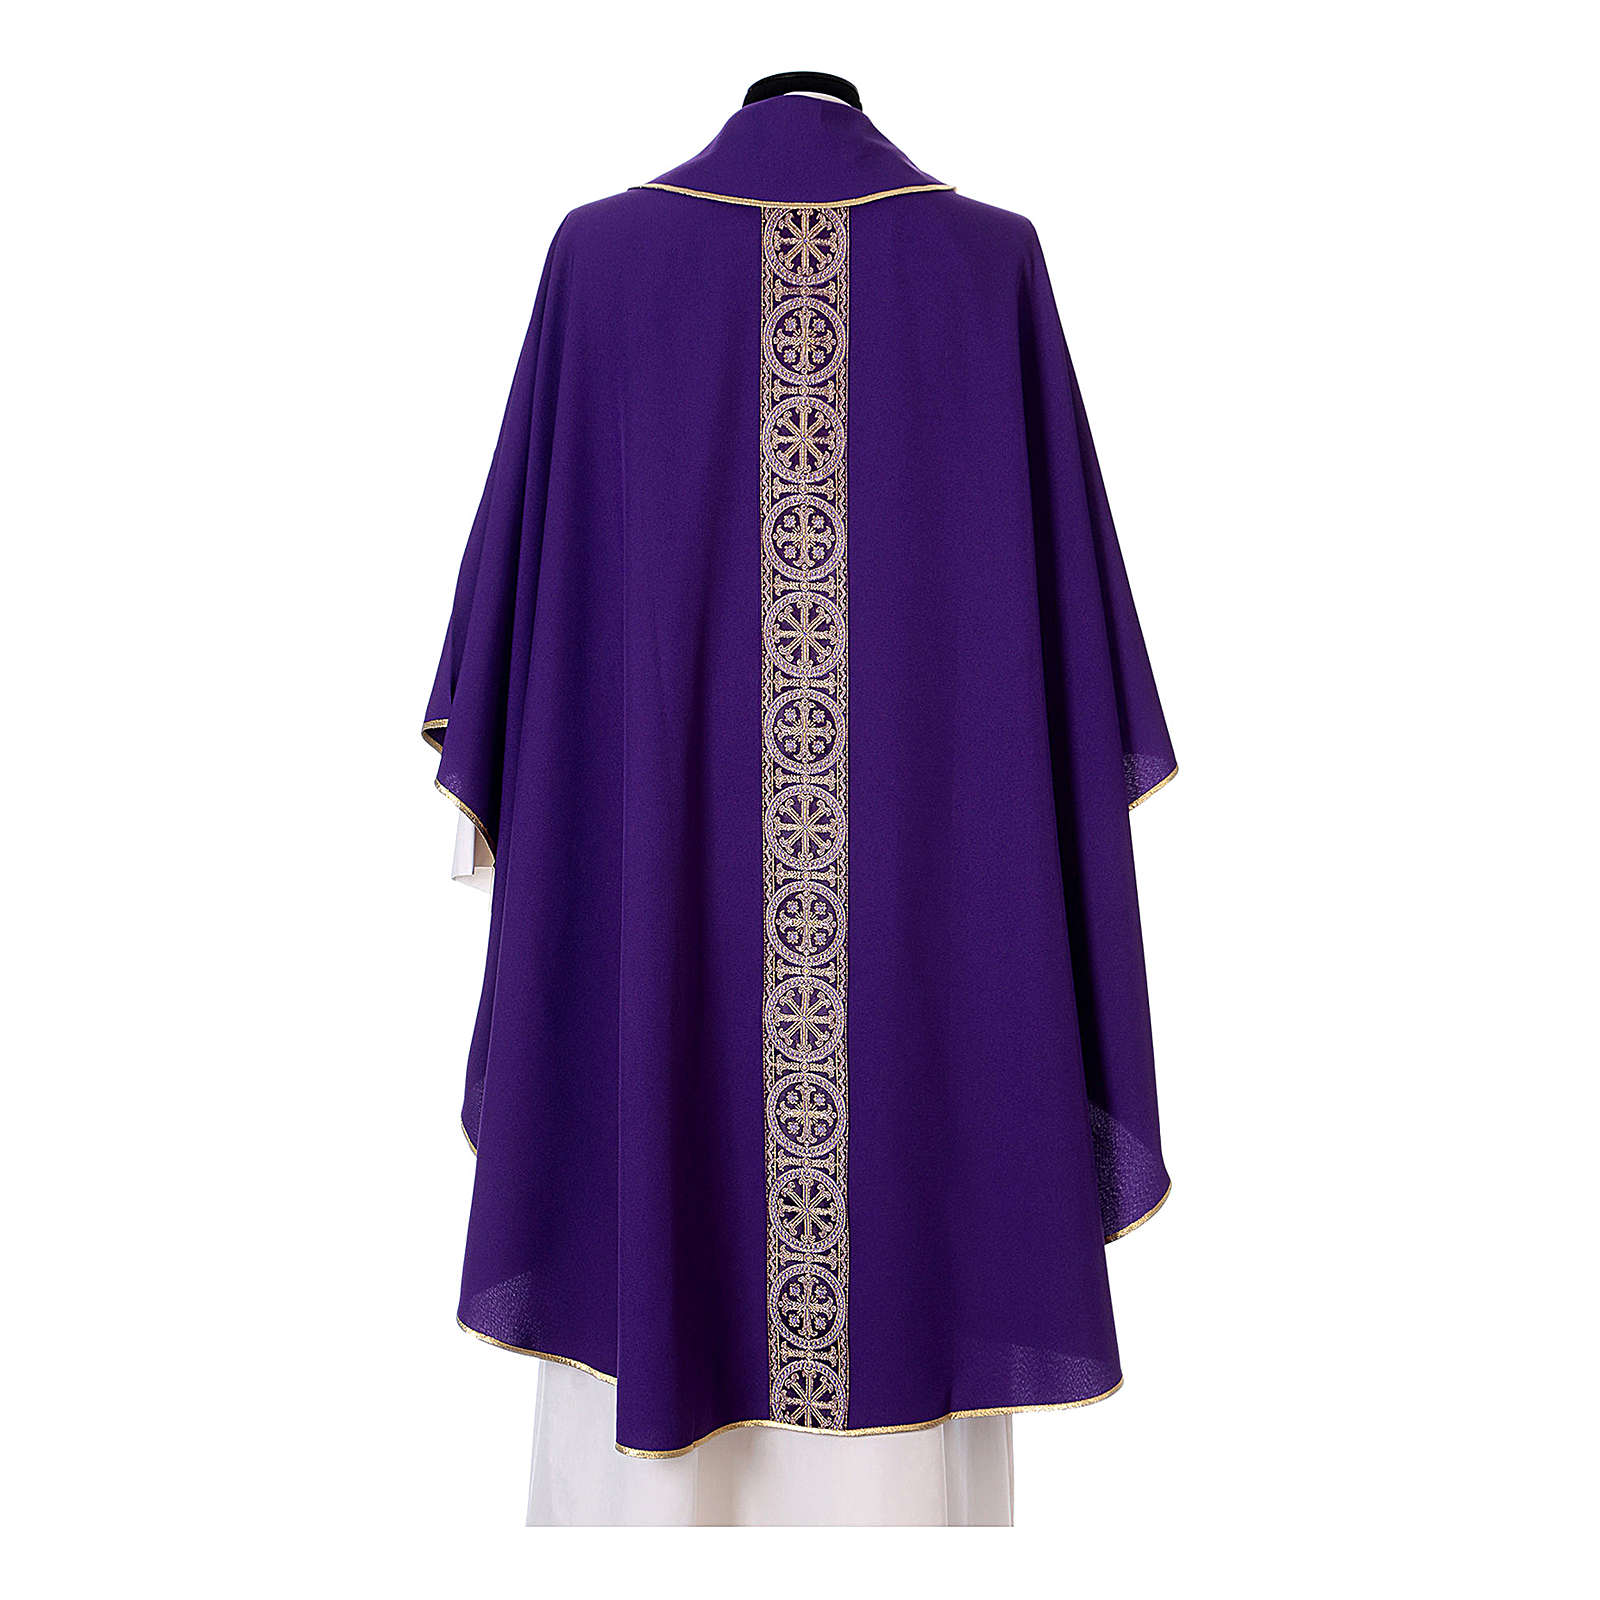 Ornat z galonem z przodu i z tyłu tkanina Vatican 100% poliester 4